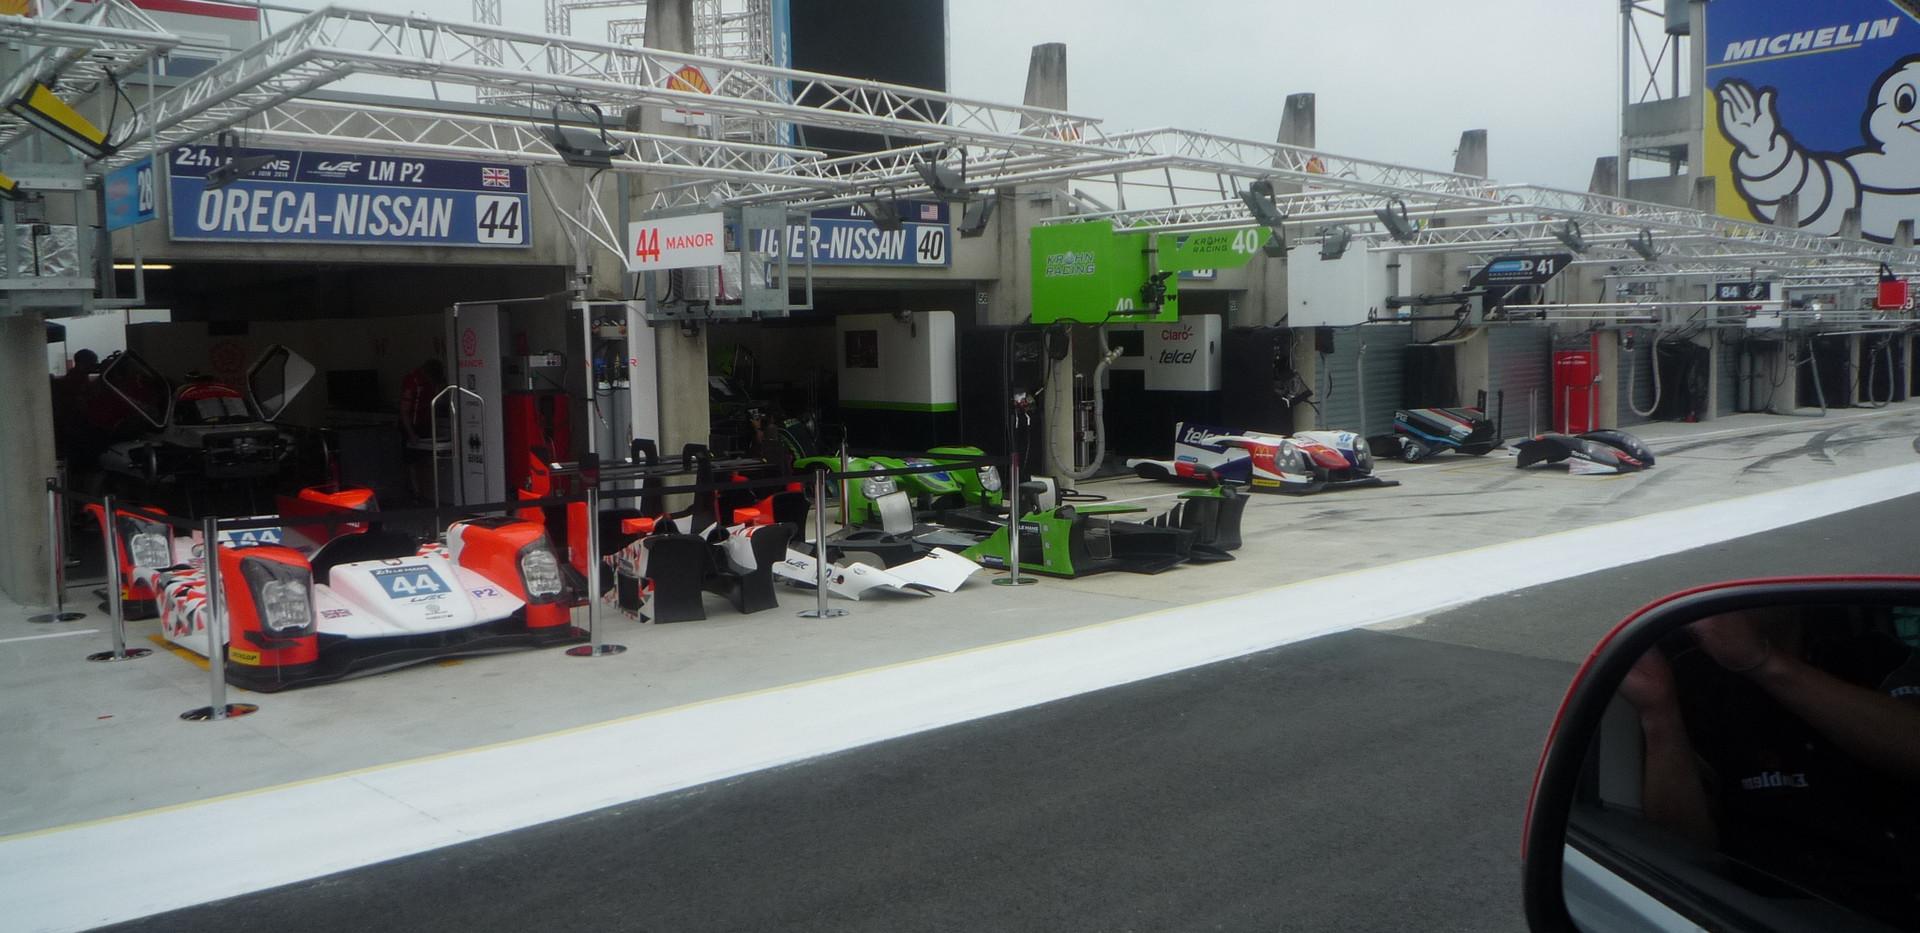 Pits at Le Mans